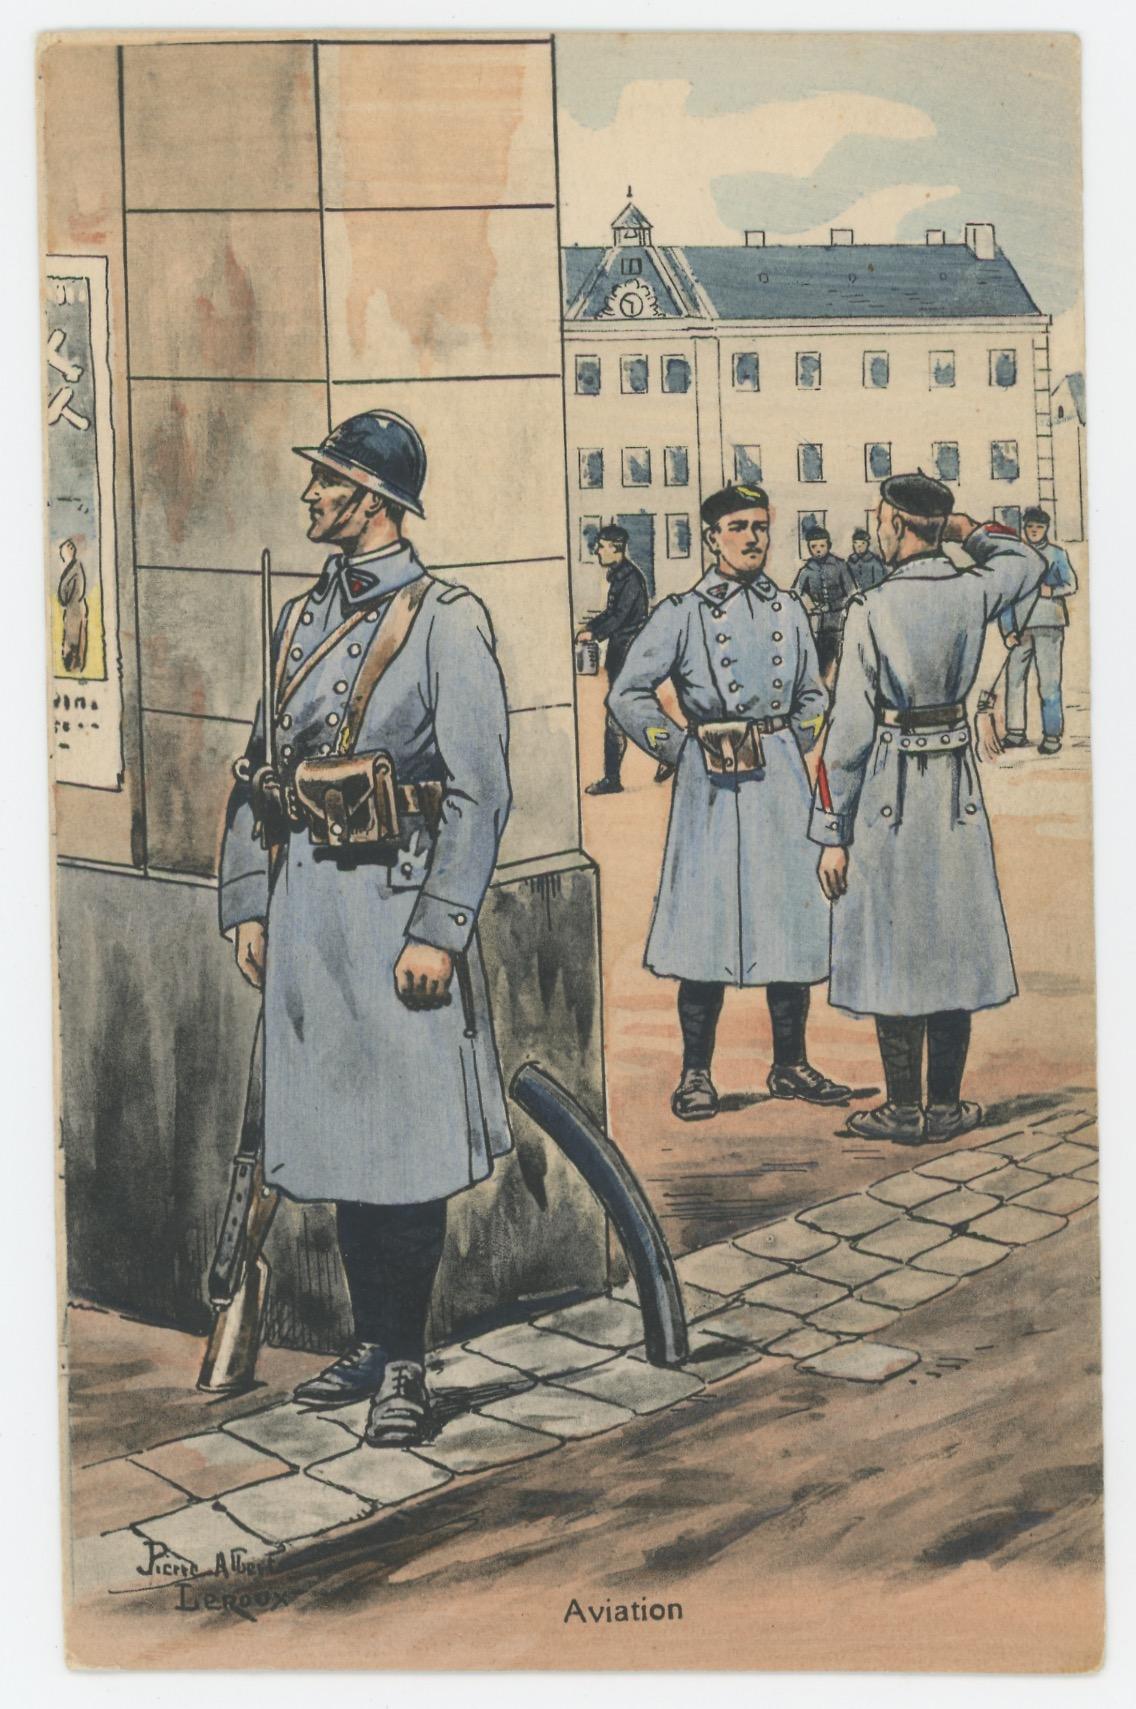 Carte Postale Illustrée - Pierre Albert Leroux- Edition Militaire Illustrées - Aviation - 1929 - Garde Caserne